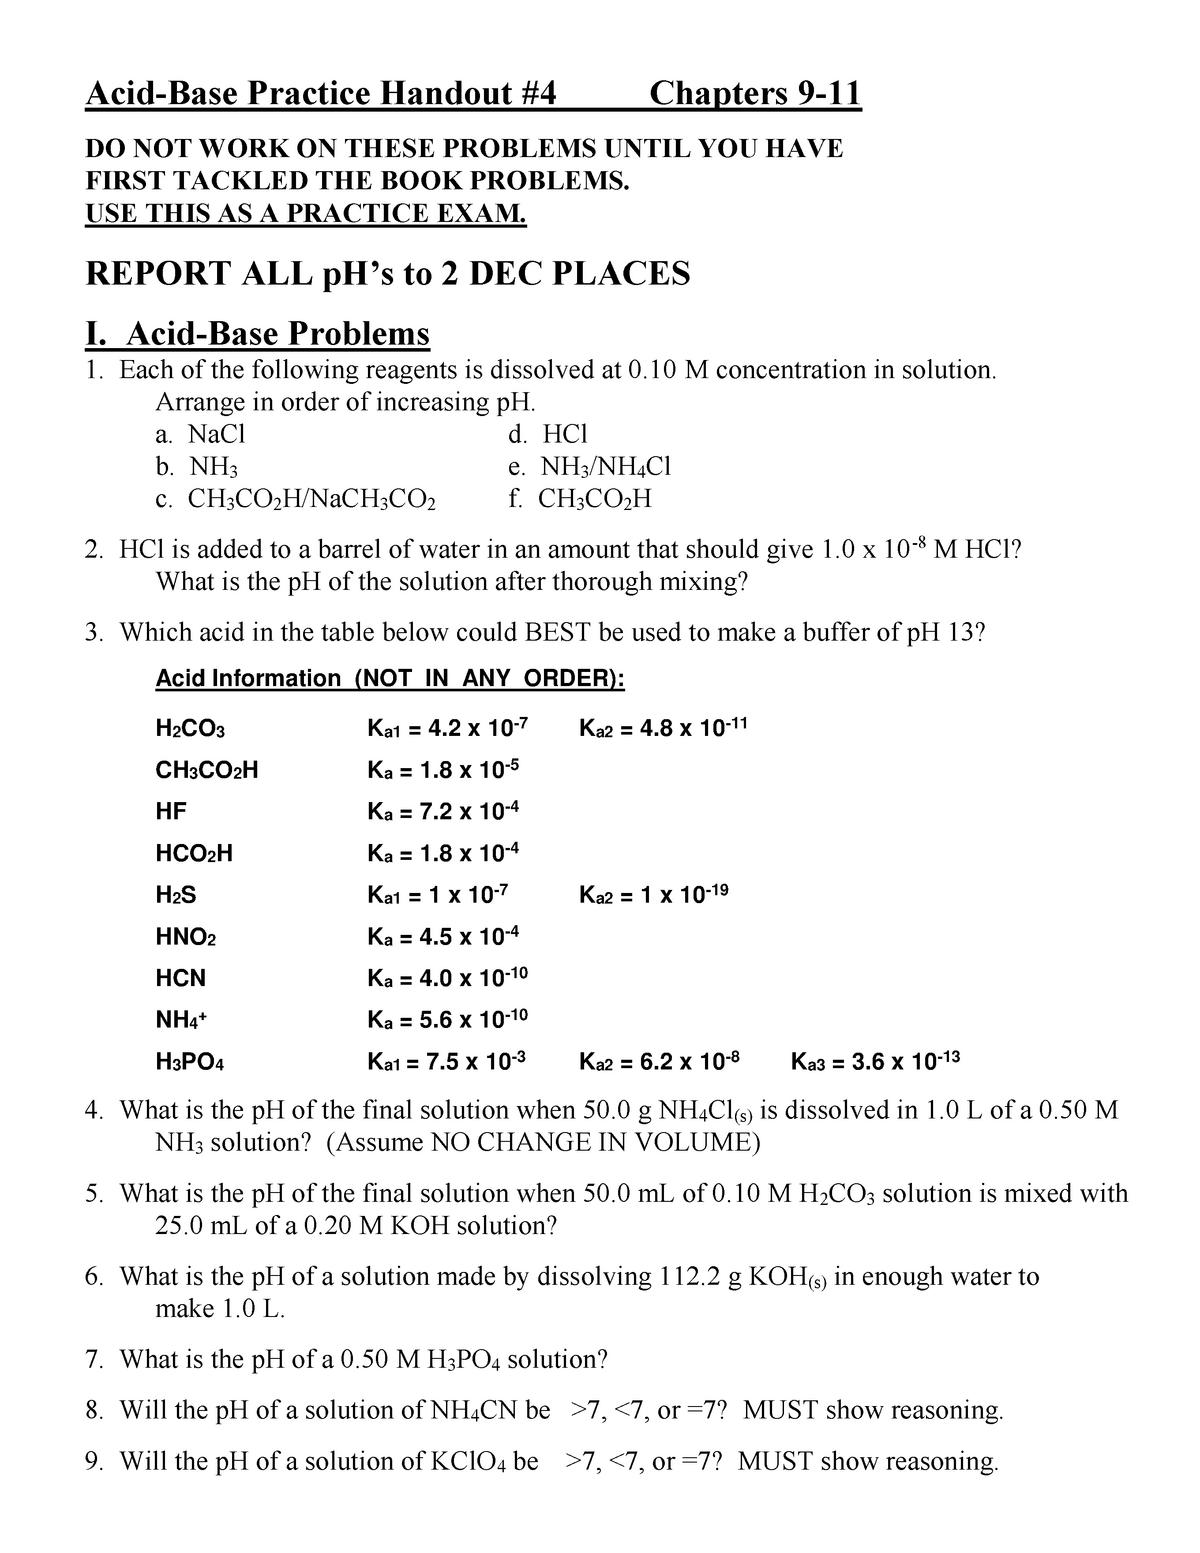 Acid-Base Practice Handout 4 - Practice Exam - CHEM 241: Modern